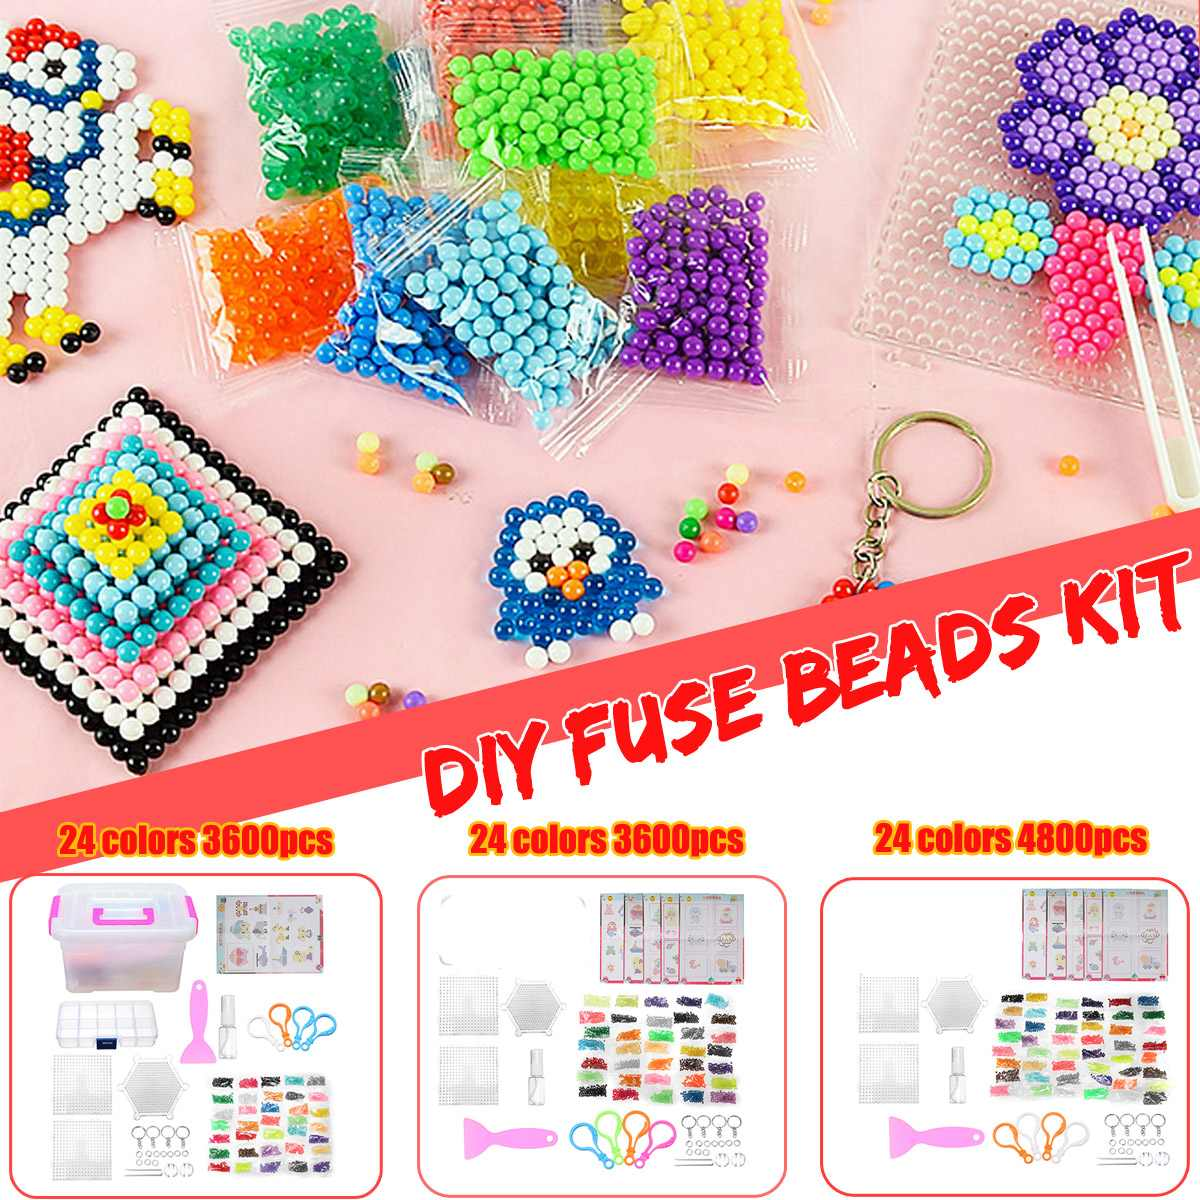 3600/4800pcs 24 Colors DIY Fuse Beads Water Sticky Beads Fun Art Craft  Intelligence Toys Kids Adult Novelty Gift Present Set